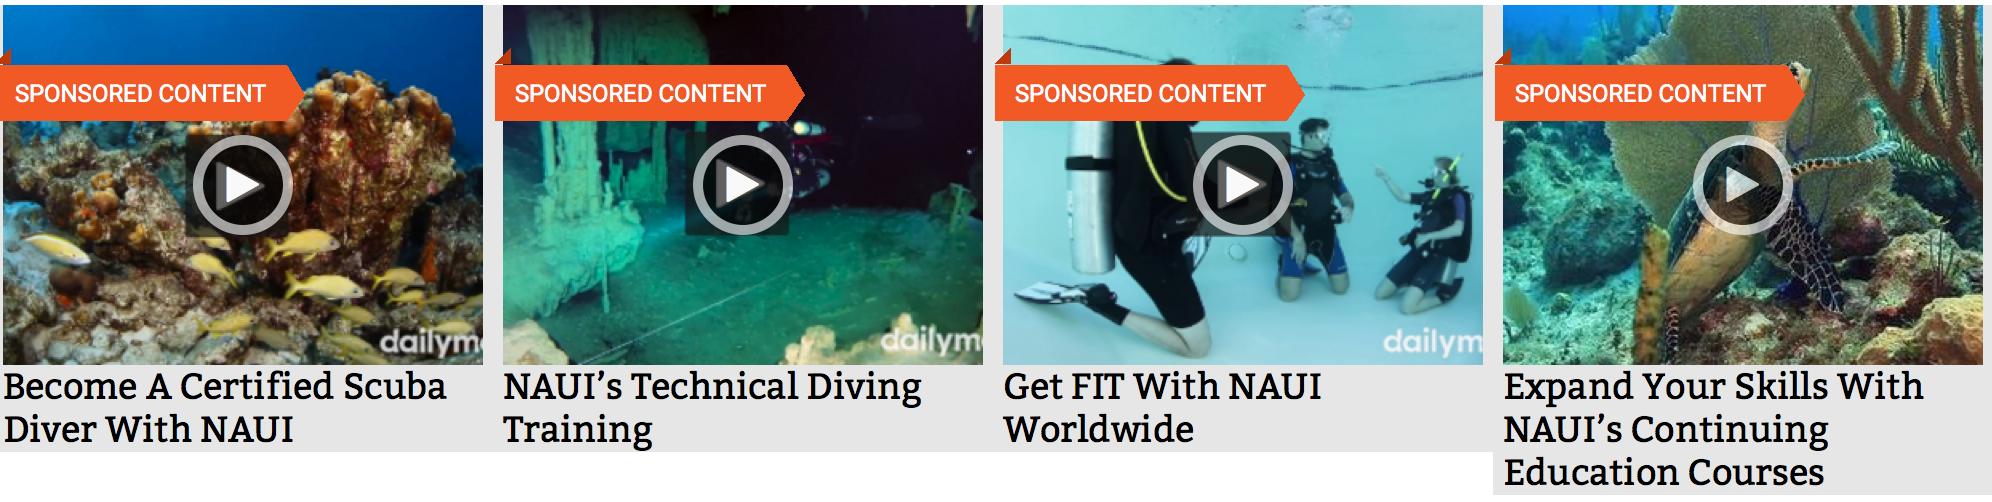 Naui Releases Worldwide Campaign Naui Worldwide Dive Safety